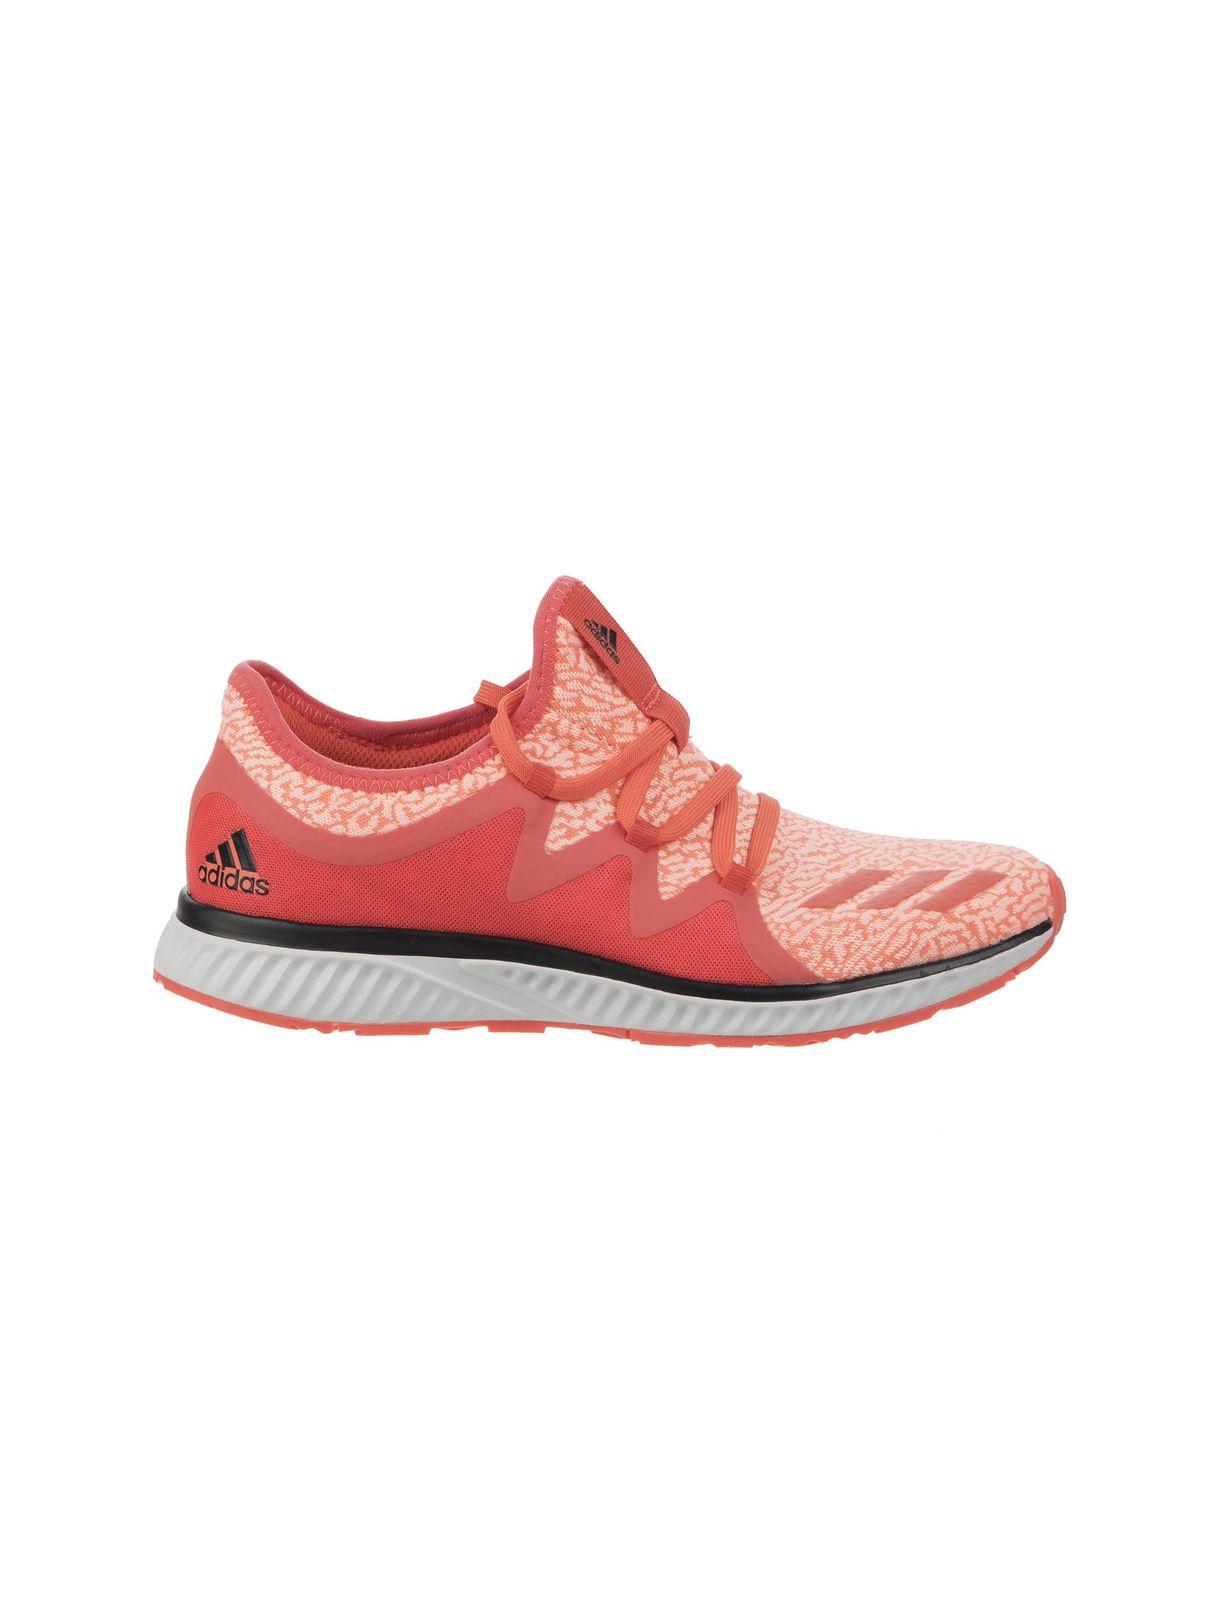 کفش مخصوص دویدن زنانه آدیداس مدل BW1068  Adidas BW1068 Running Lace-Up Shoes For Women